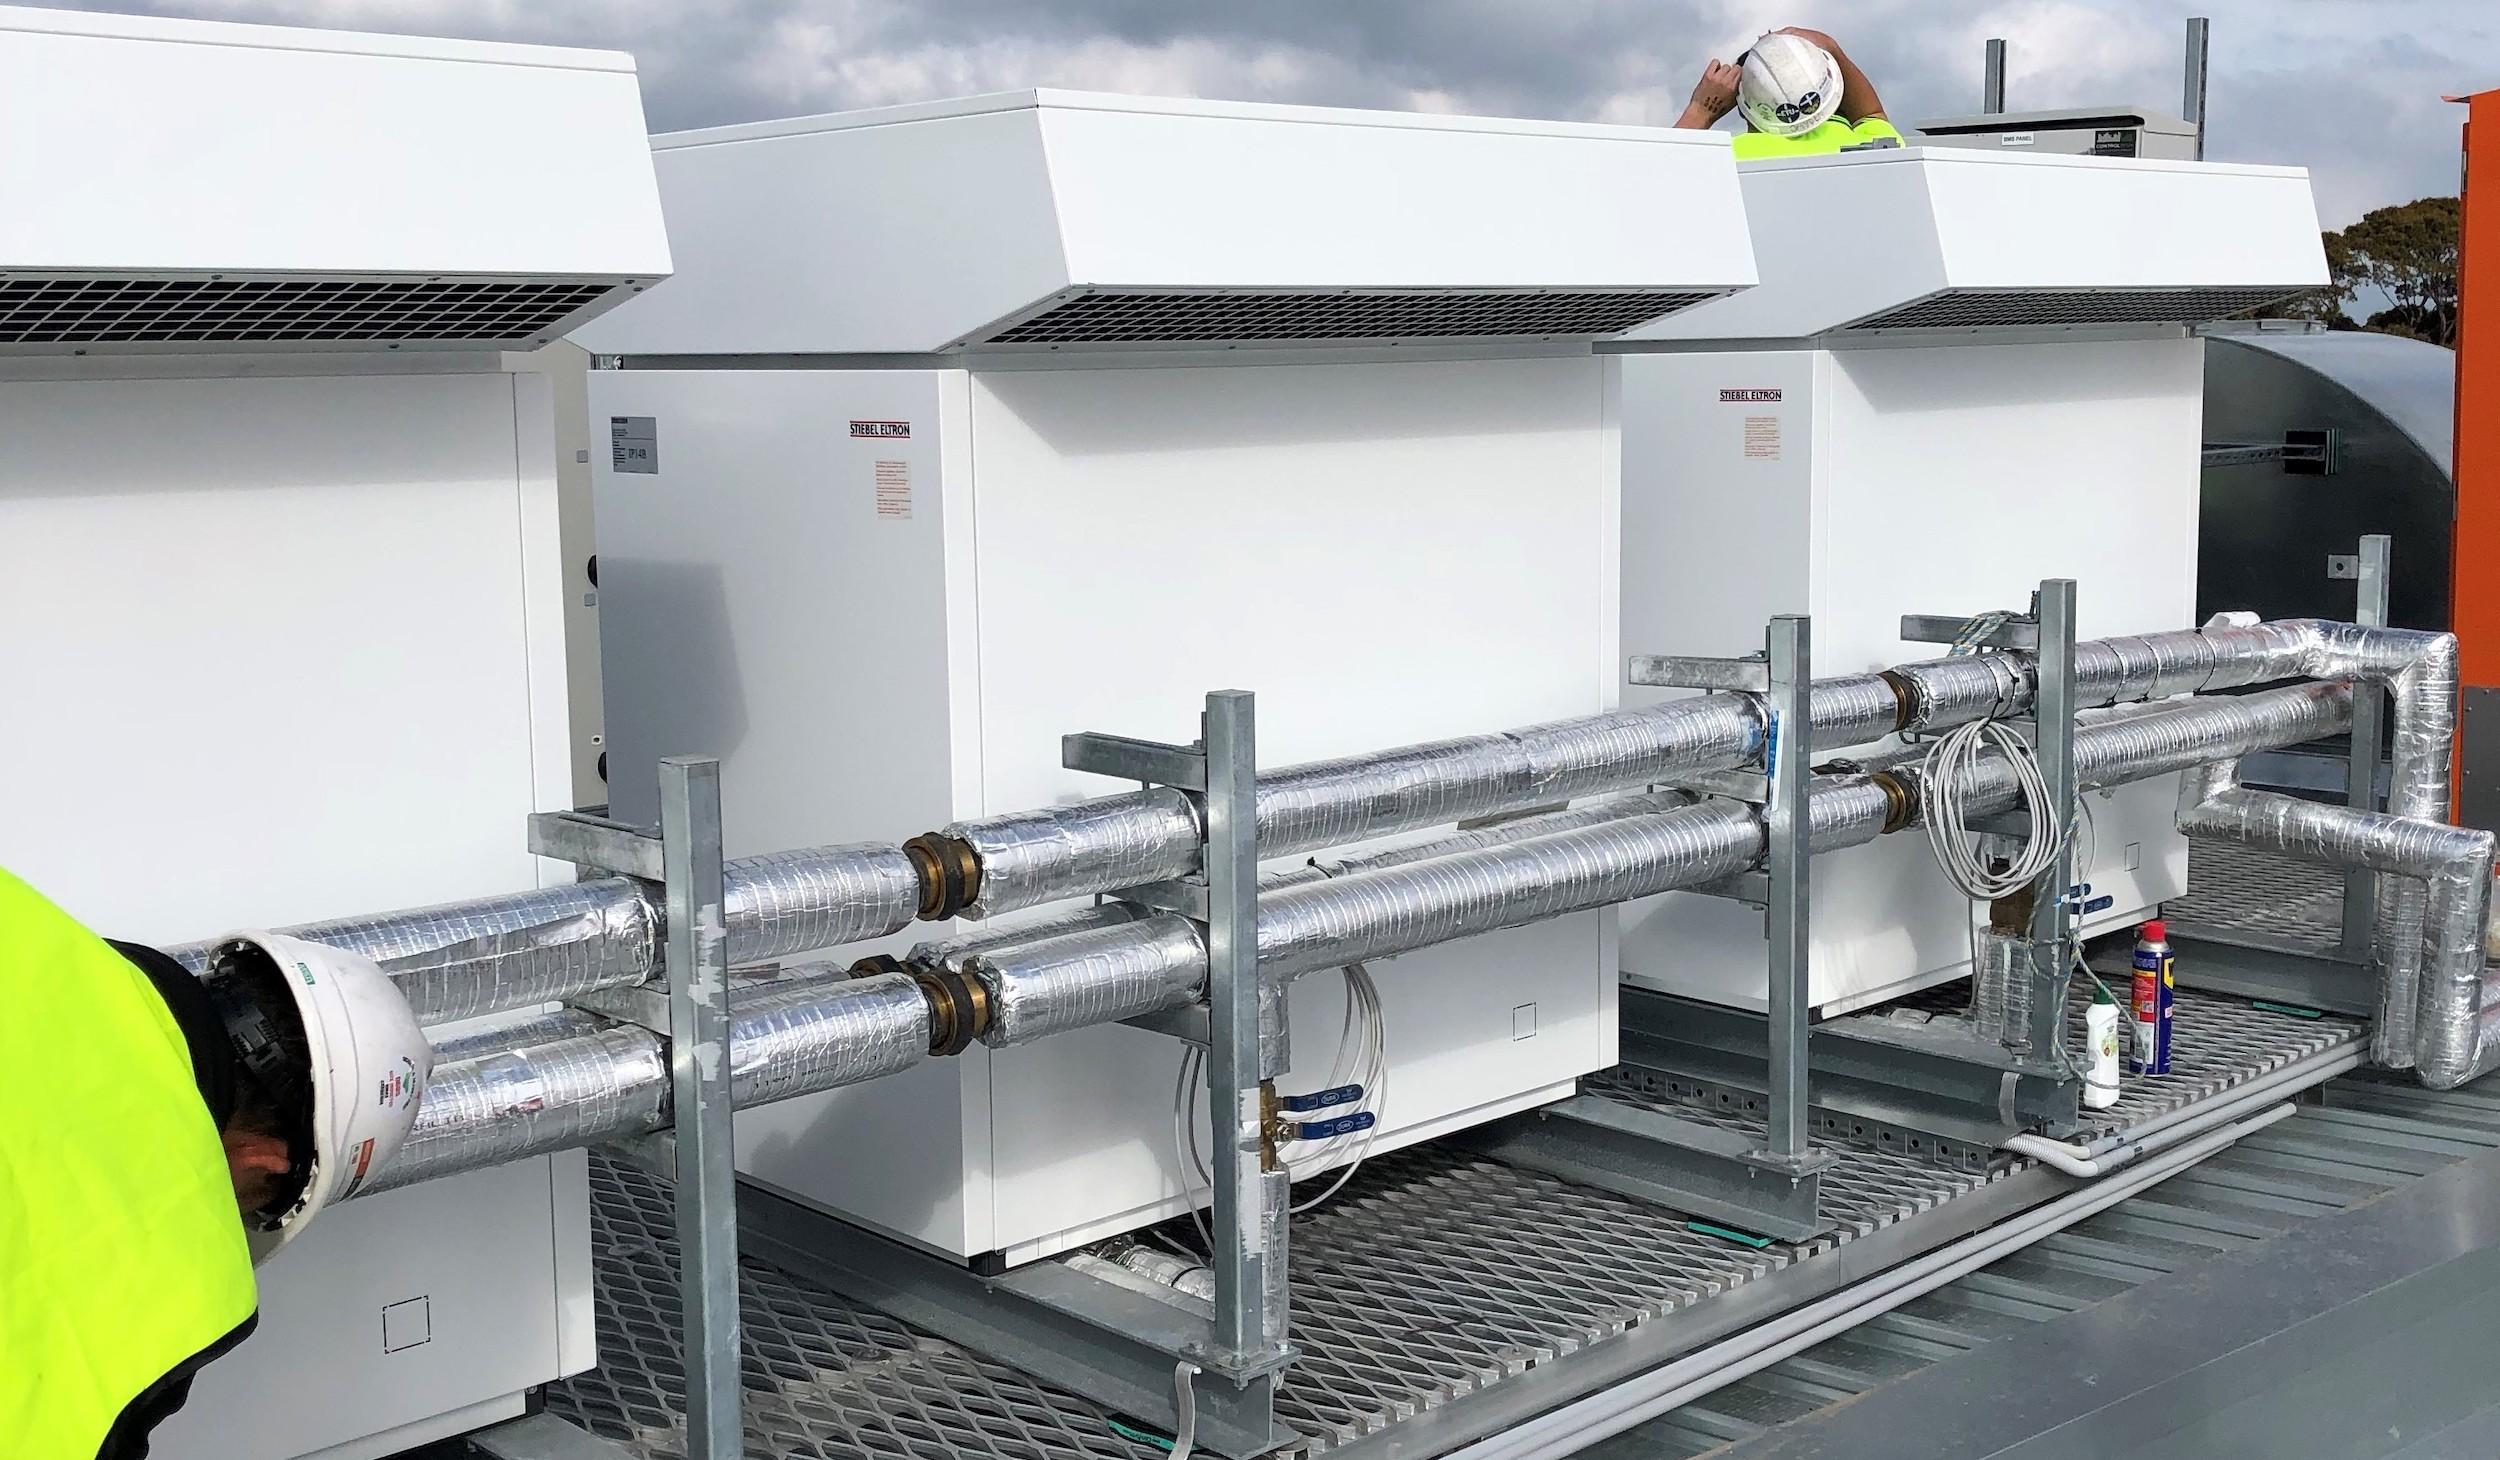 Stiebel Eltron pumps Heat Pumps on roof